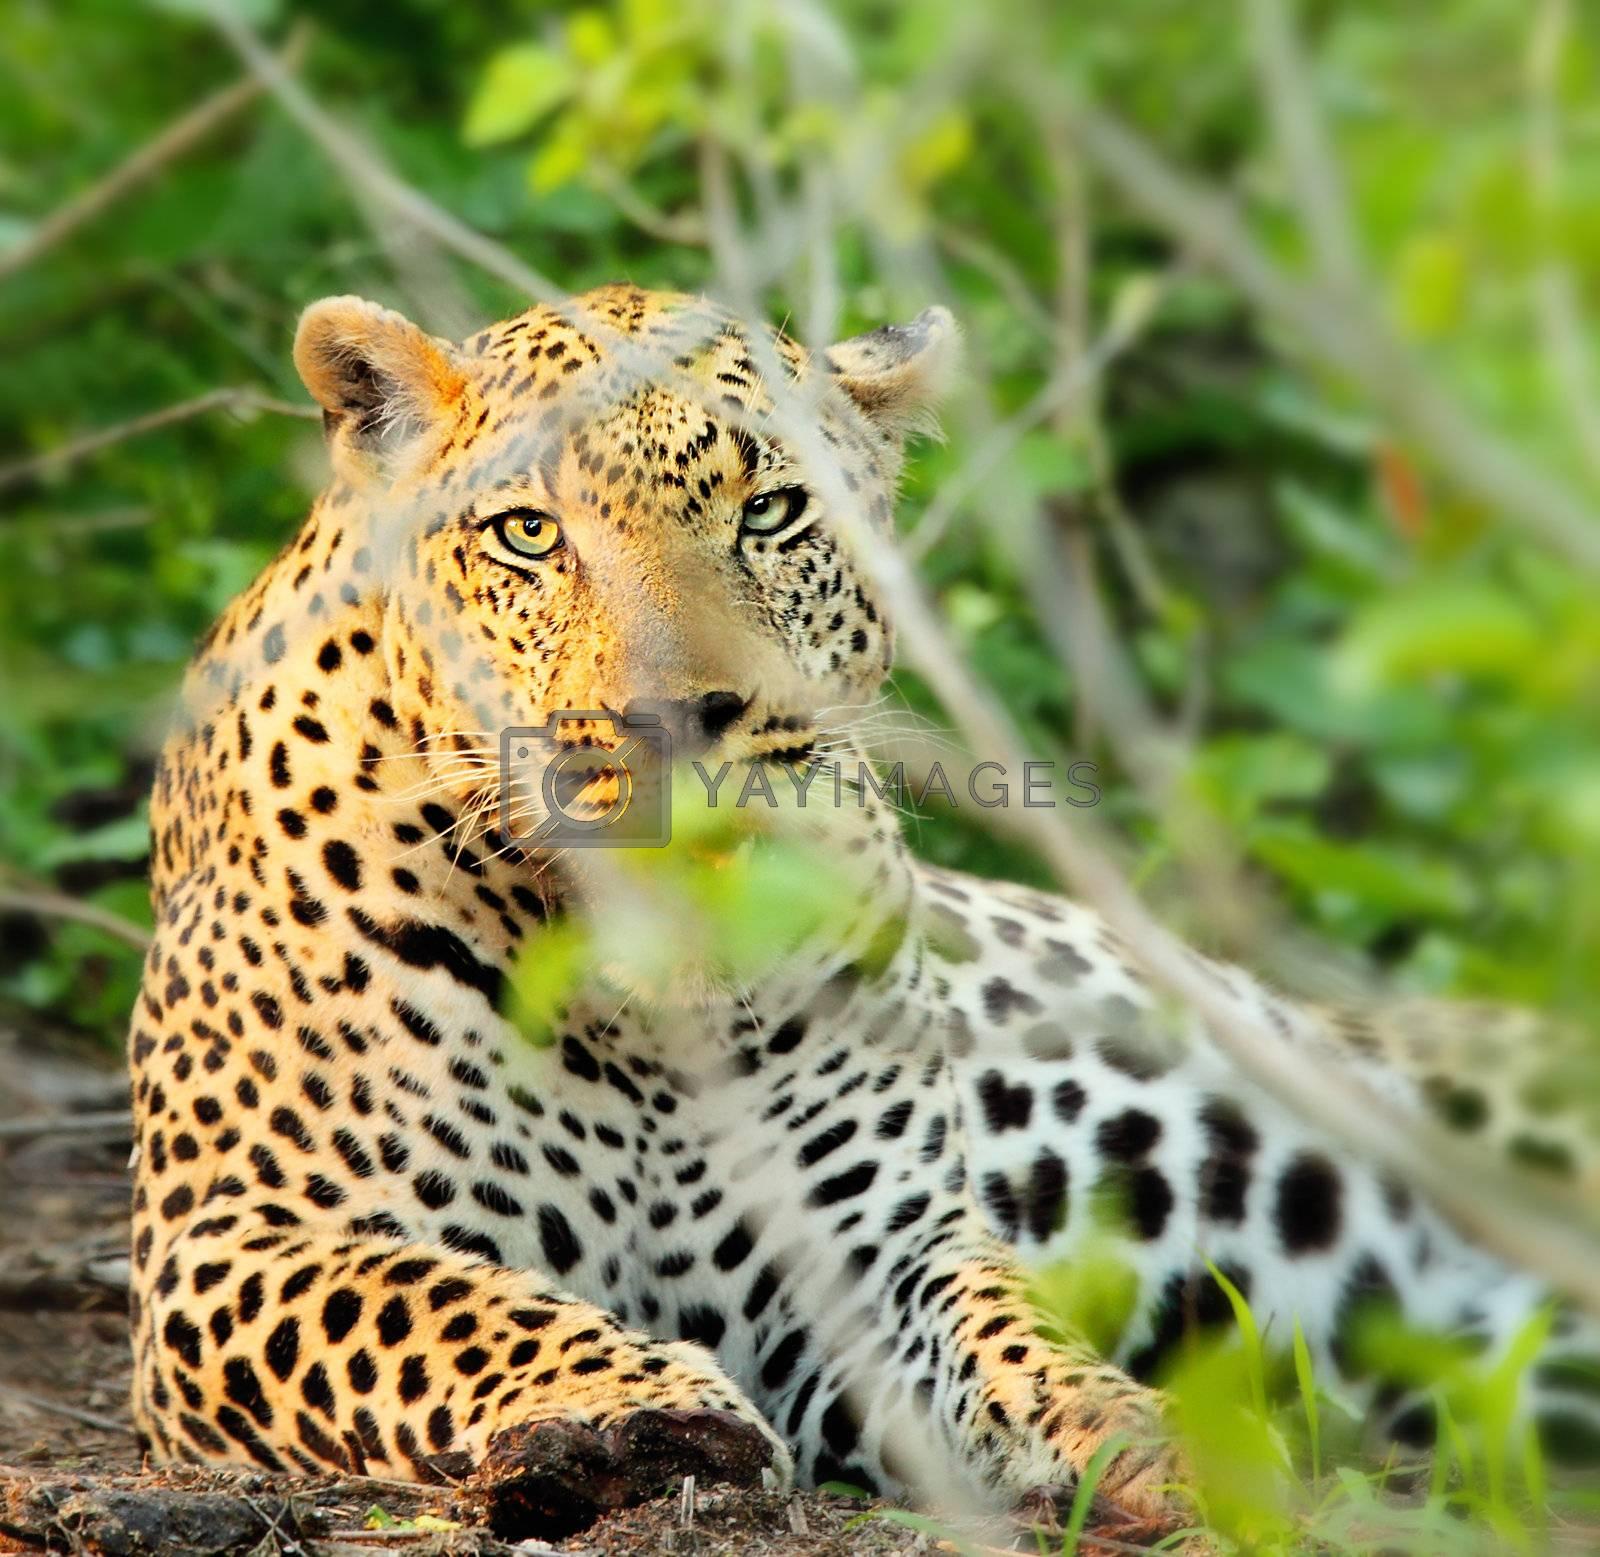 Wild leopard resting in bushes, beautiful  endangered carnivor animal, game drive wildlife safari, Eco travel and tourism, nature of South Africa, Kruger national park, Sabi Sand